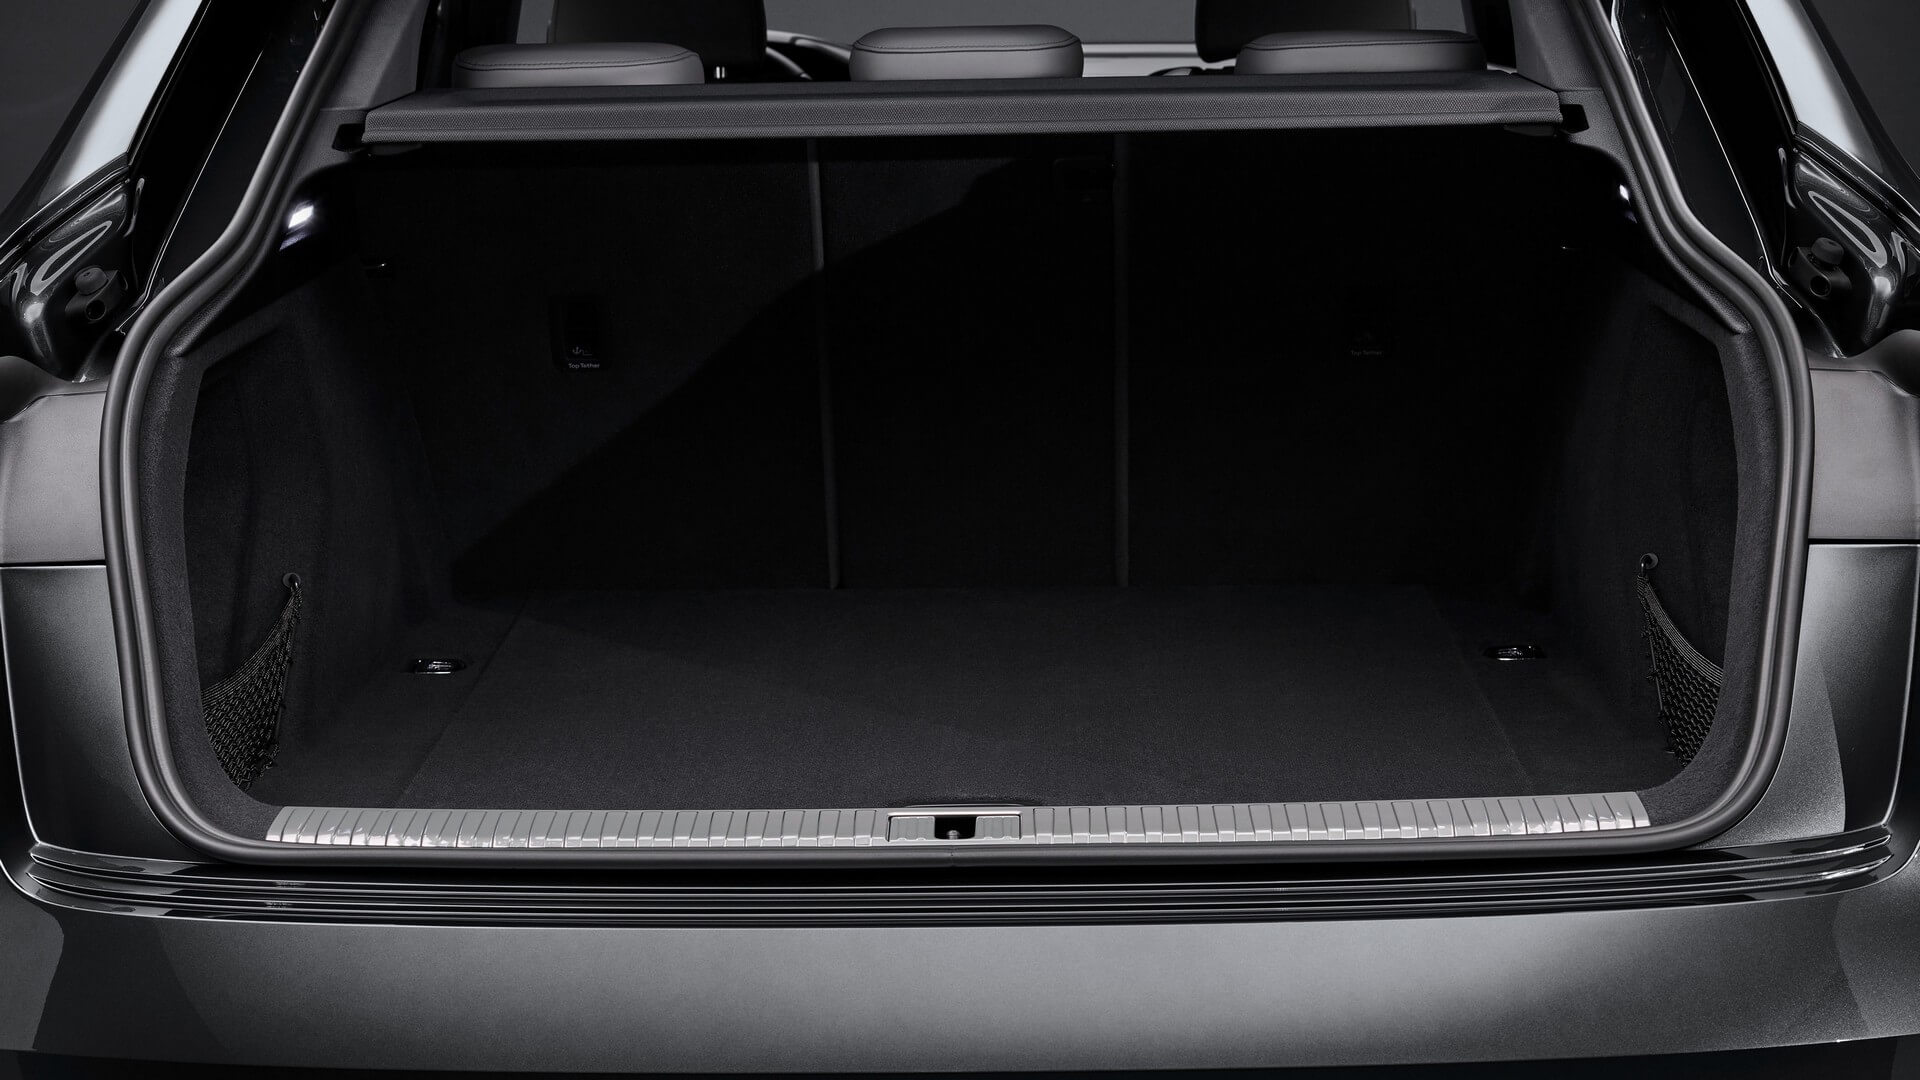 Audi-E-Tron-S-and-E-Tron-S-Sportback-2020-85